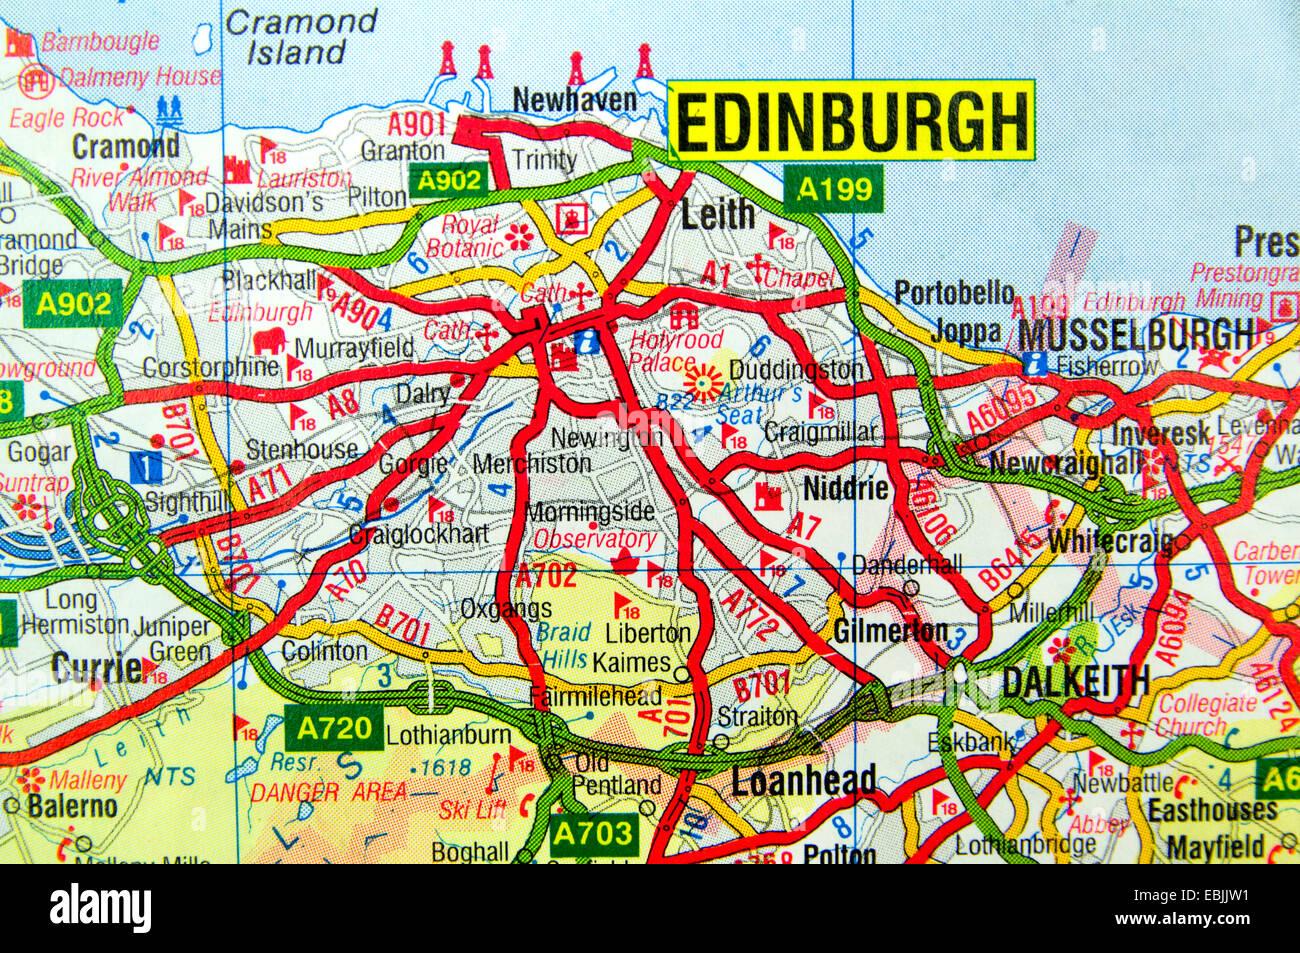 Map Of Edinburgh Stockfotos & Map Of Edinburgh Bilder - Alamy